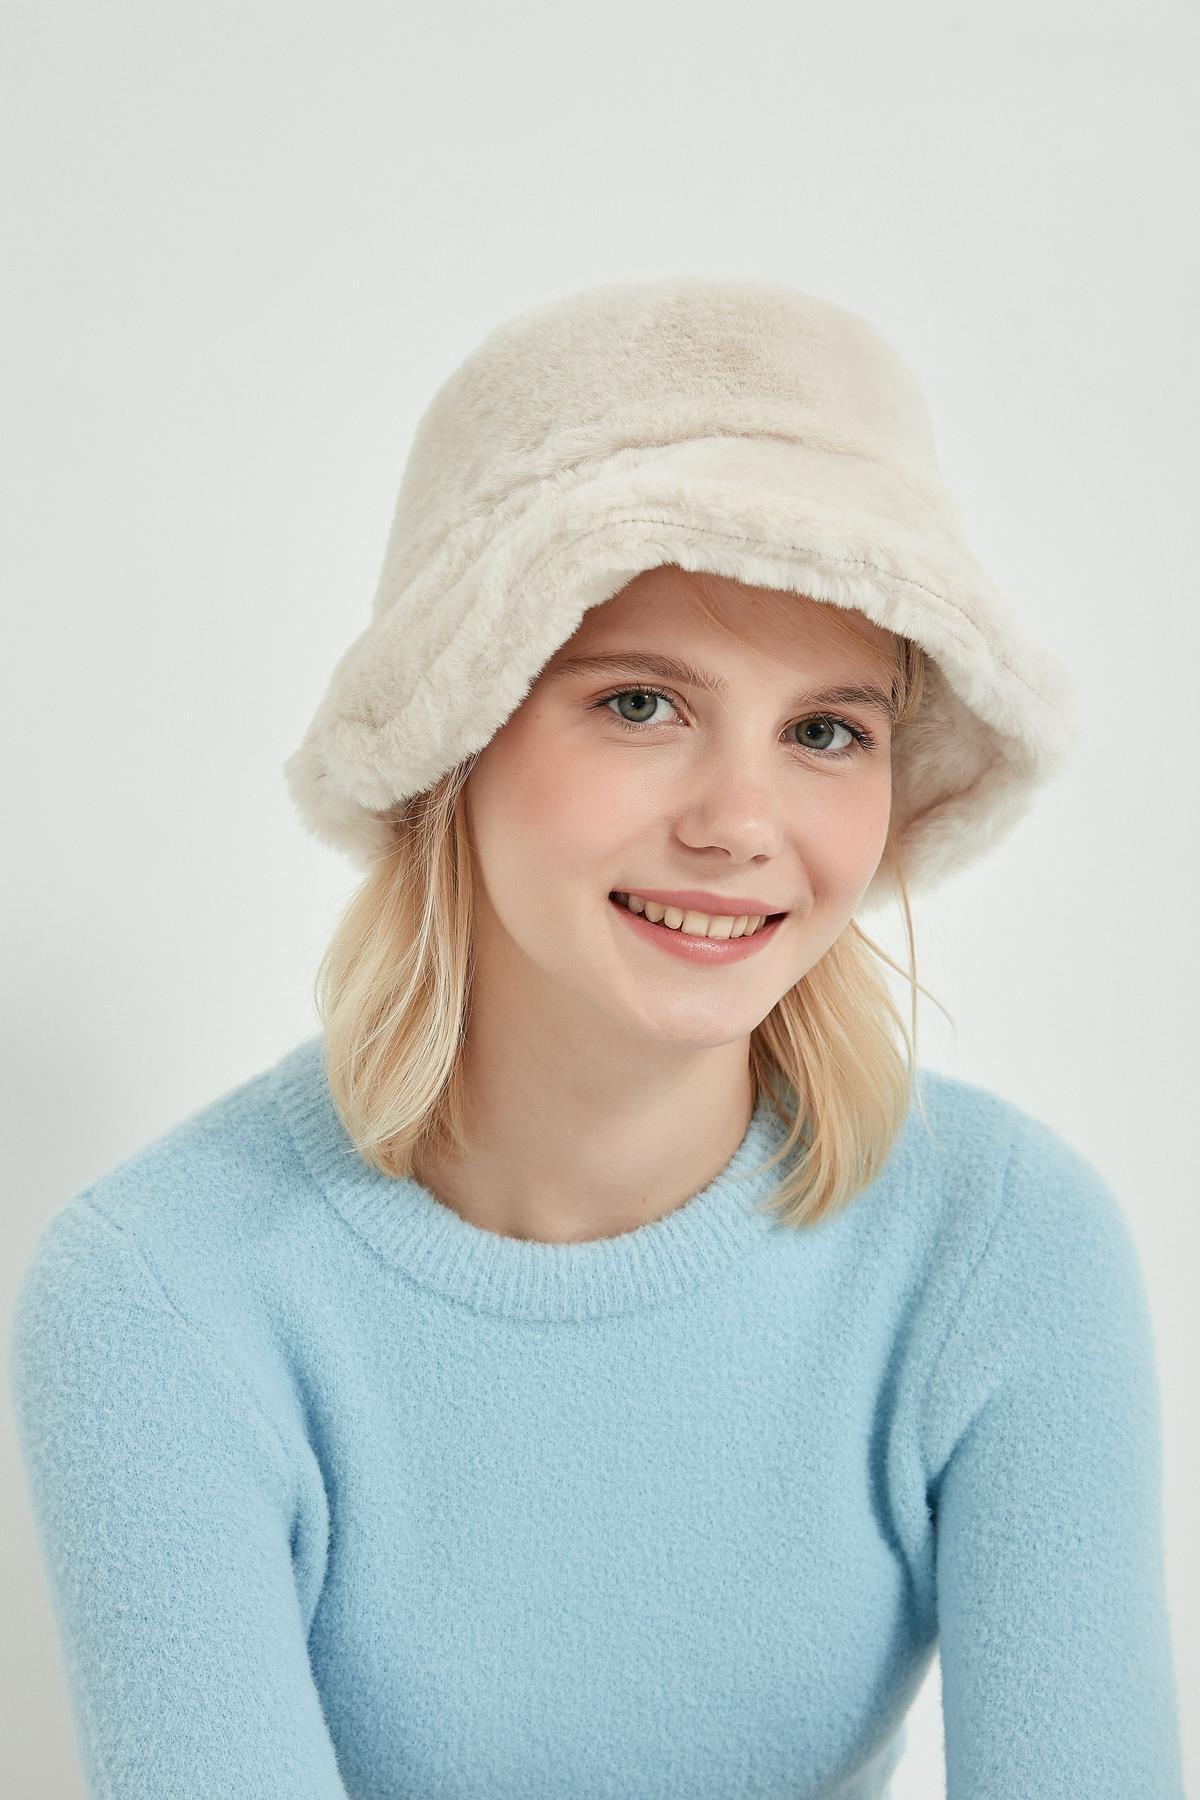 Y-London 12839-1 Bej Renk Bucket Şapka 1